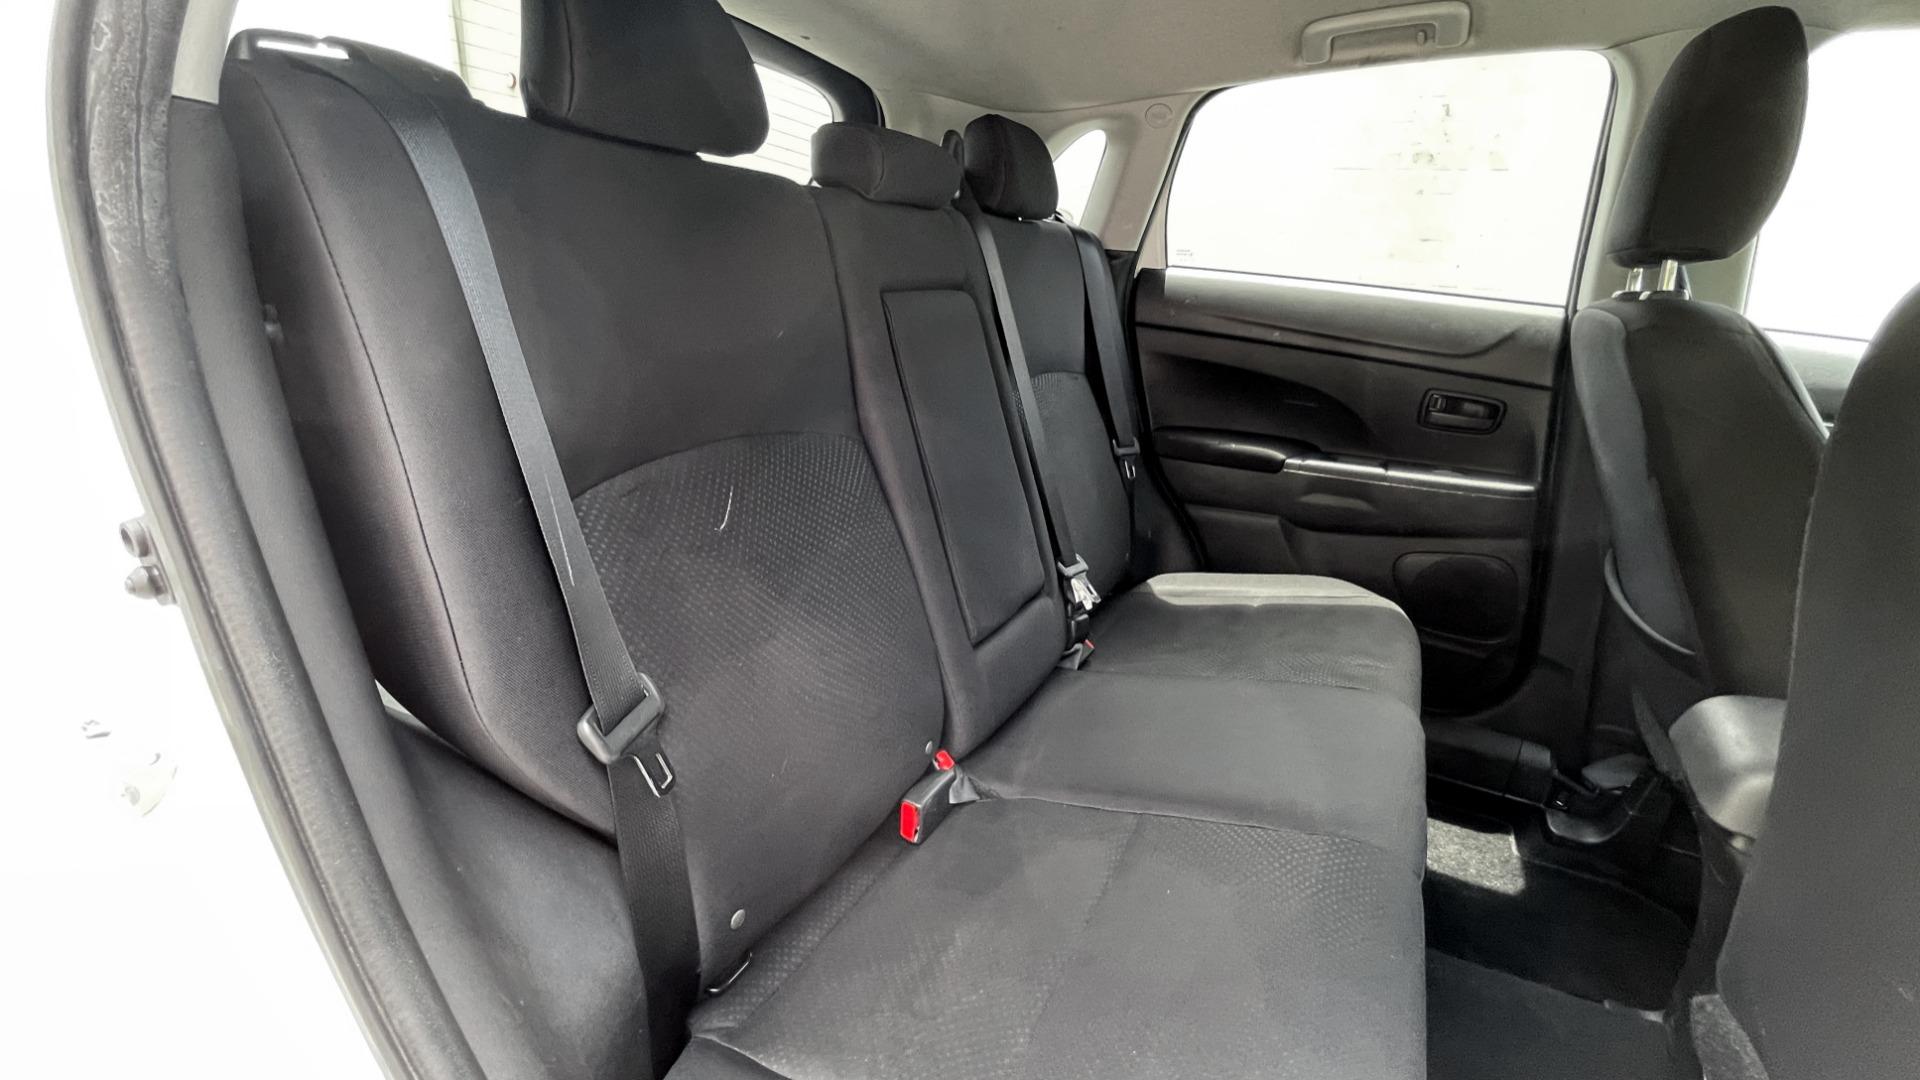 Used 2014 Mitsubishi OUTLANDER SPORT ES 2WD / 2.0L / CVT TRANS / 18IN WHEELS / 31MPG for sale $8,495 at Formula Imports in Charlotte NC 28227 50